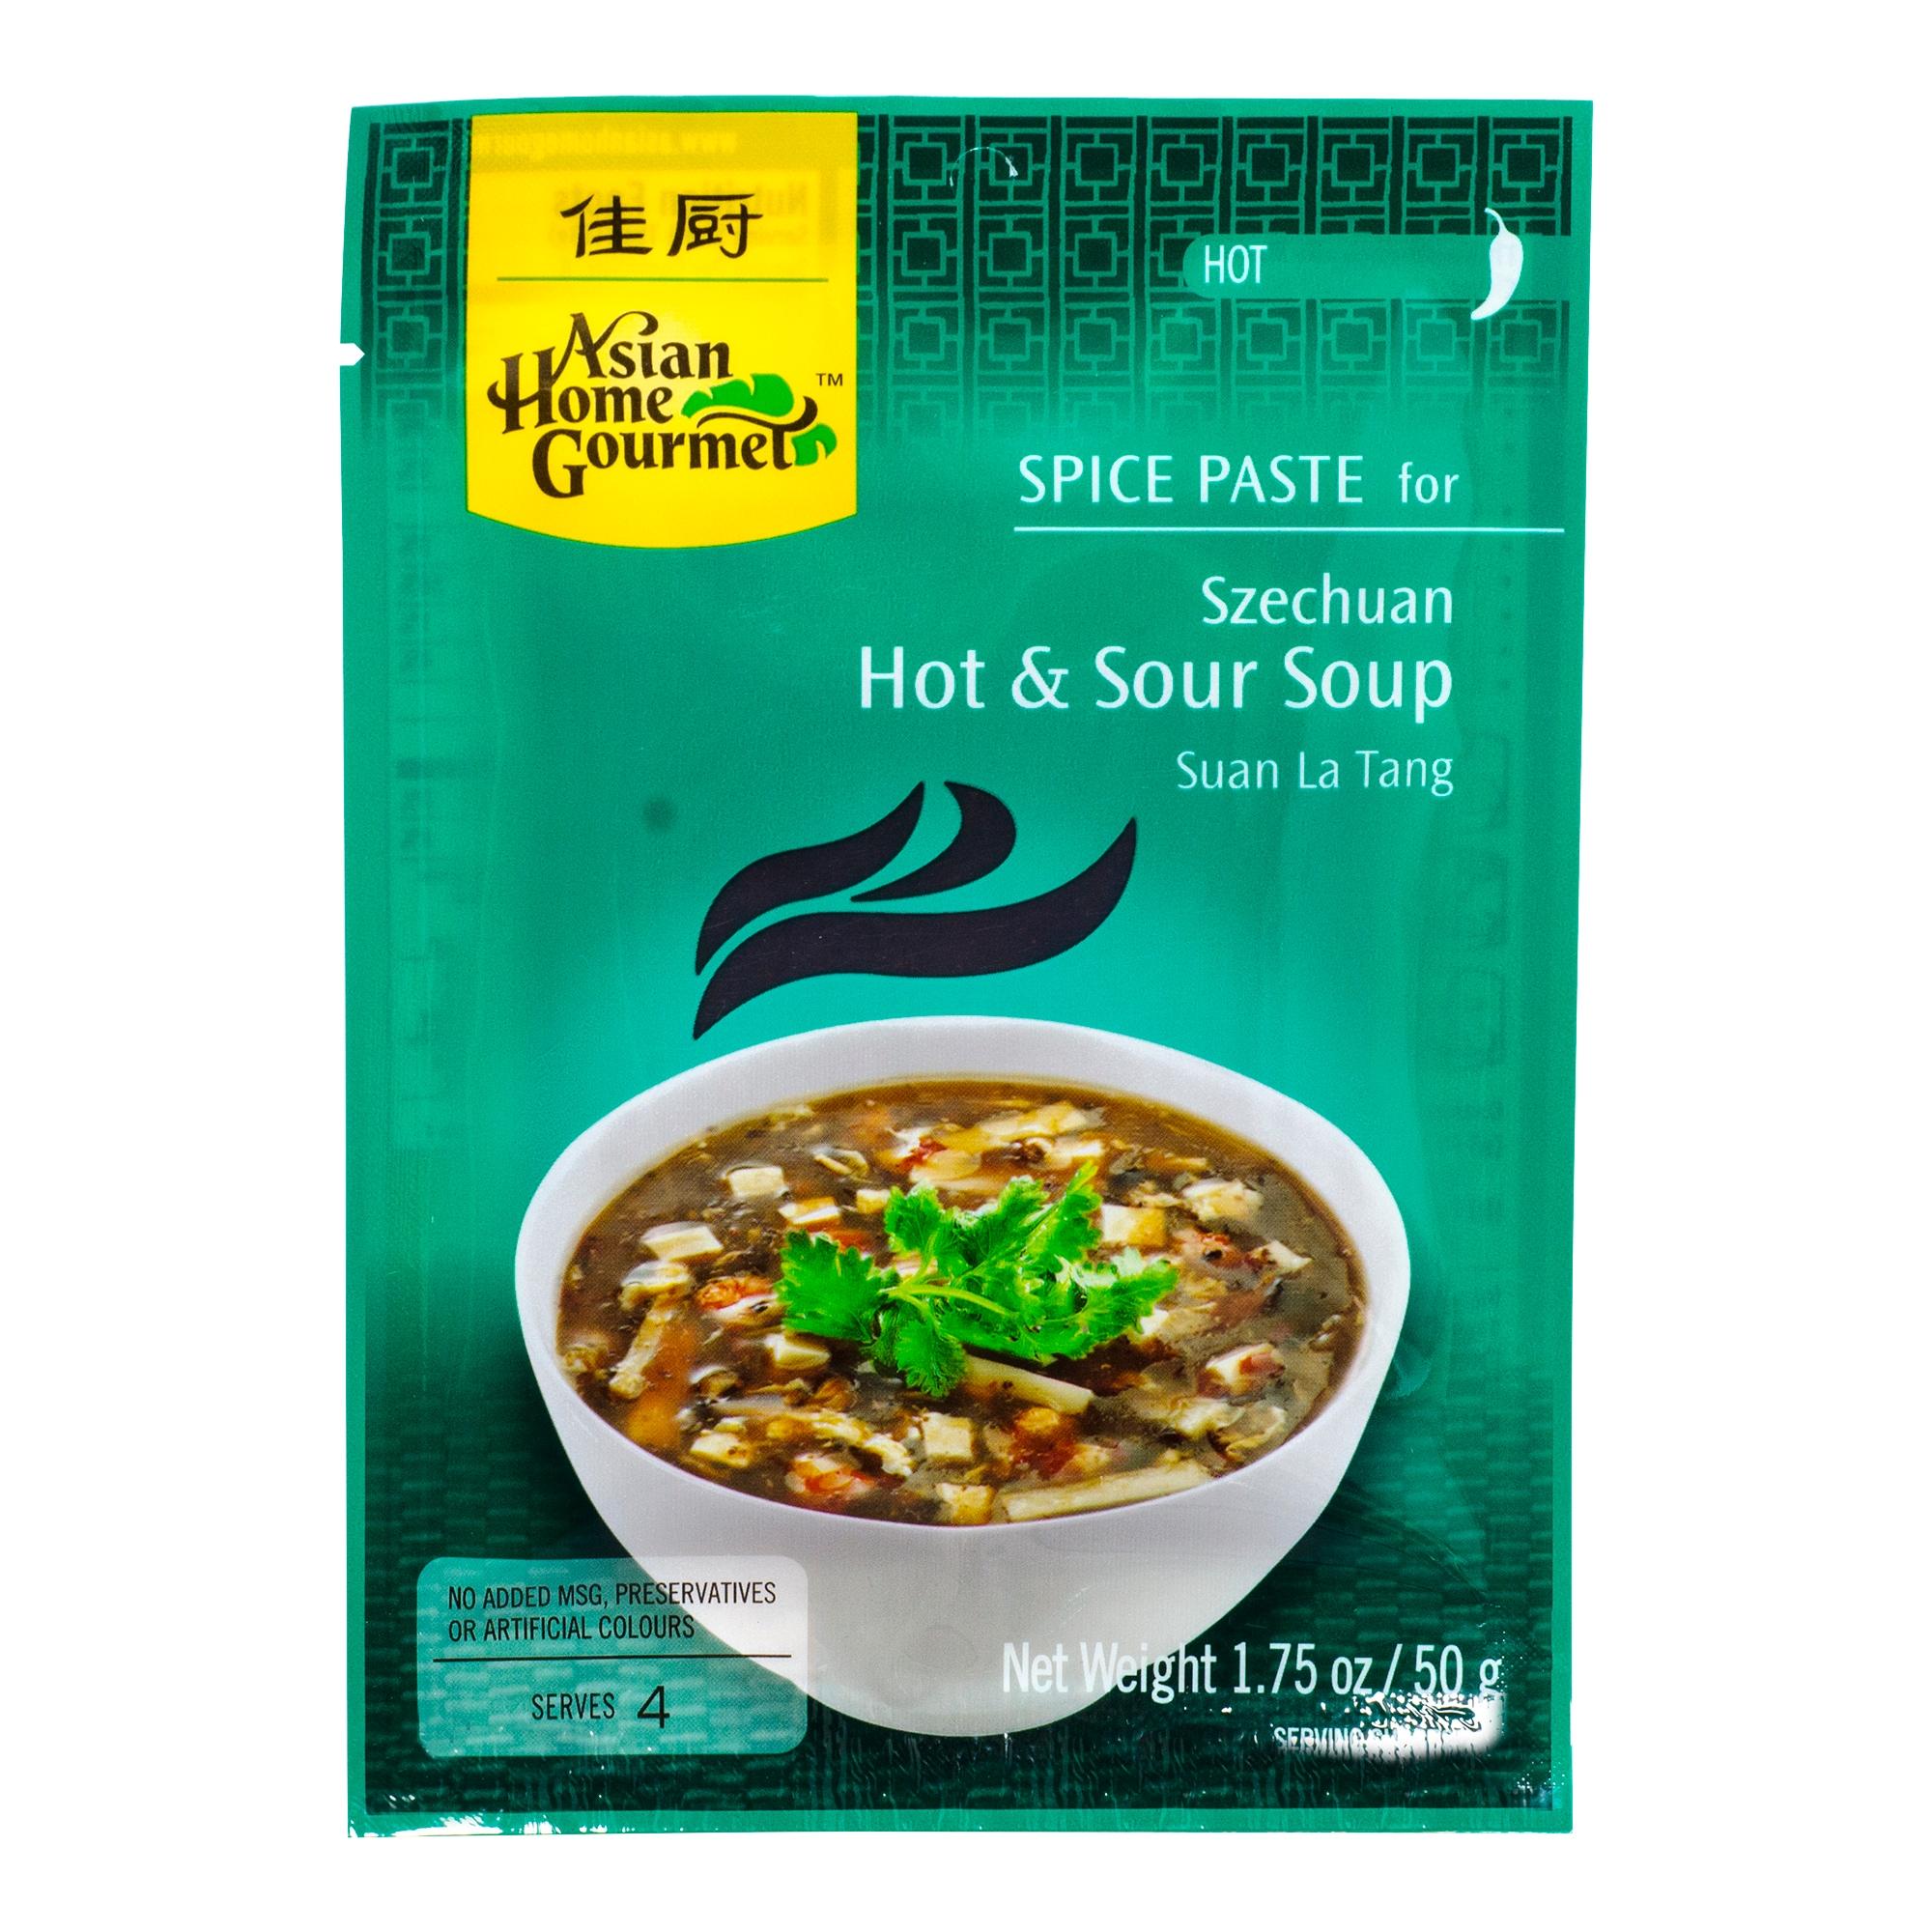 Asian Home Gourmet Hot & Sour Soup 50g